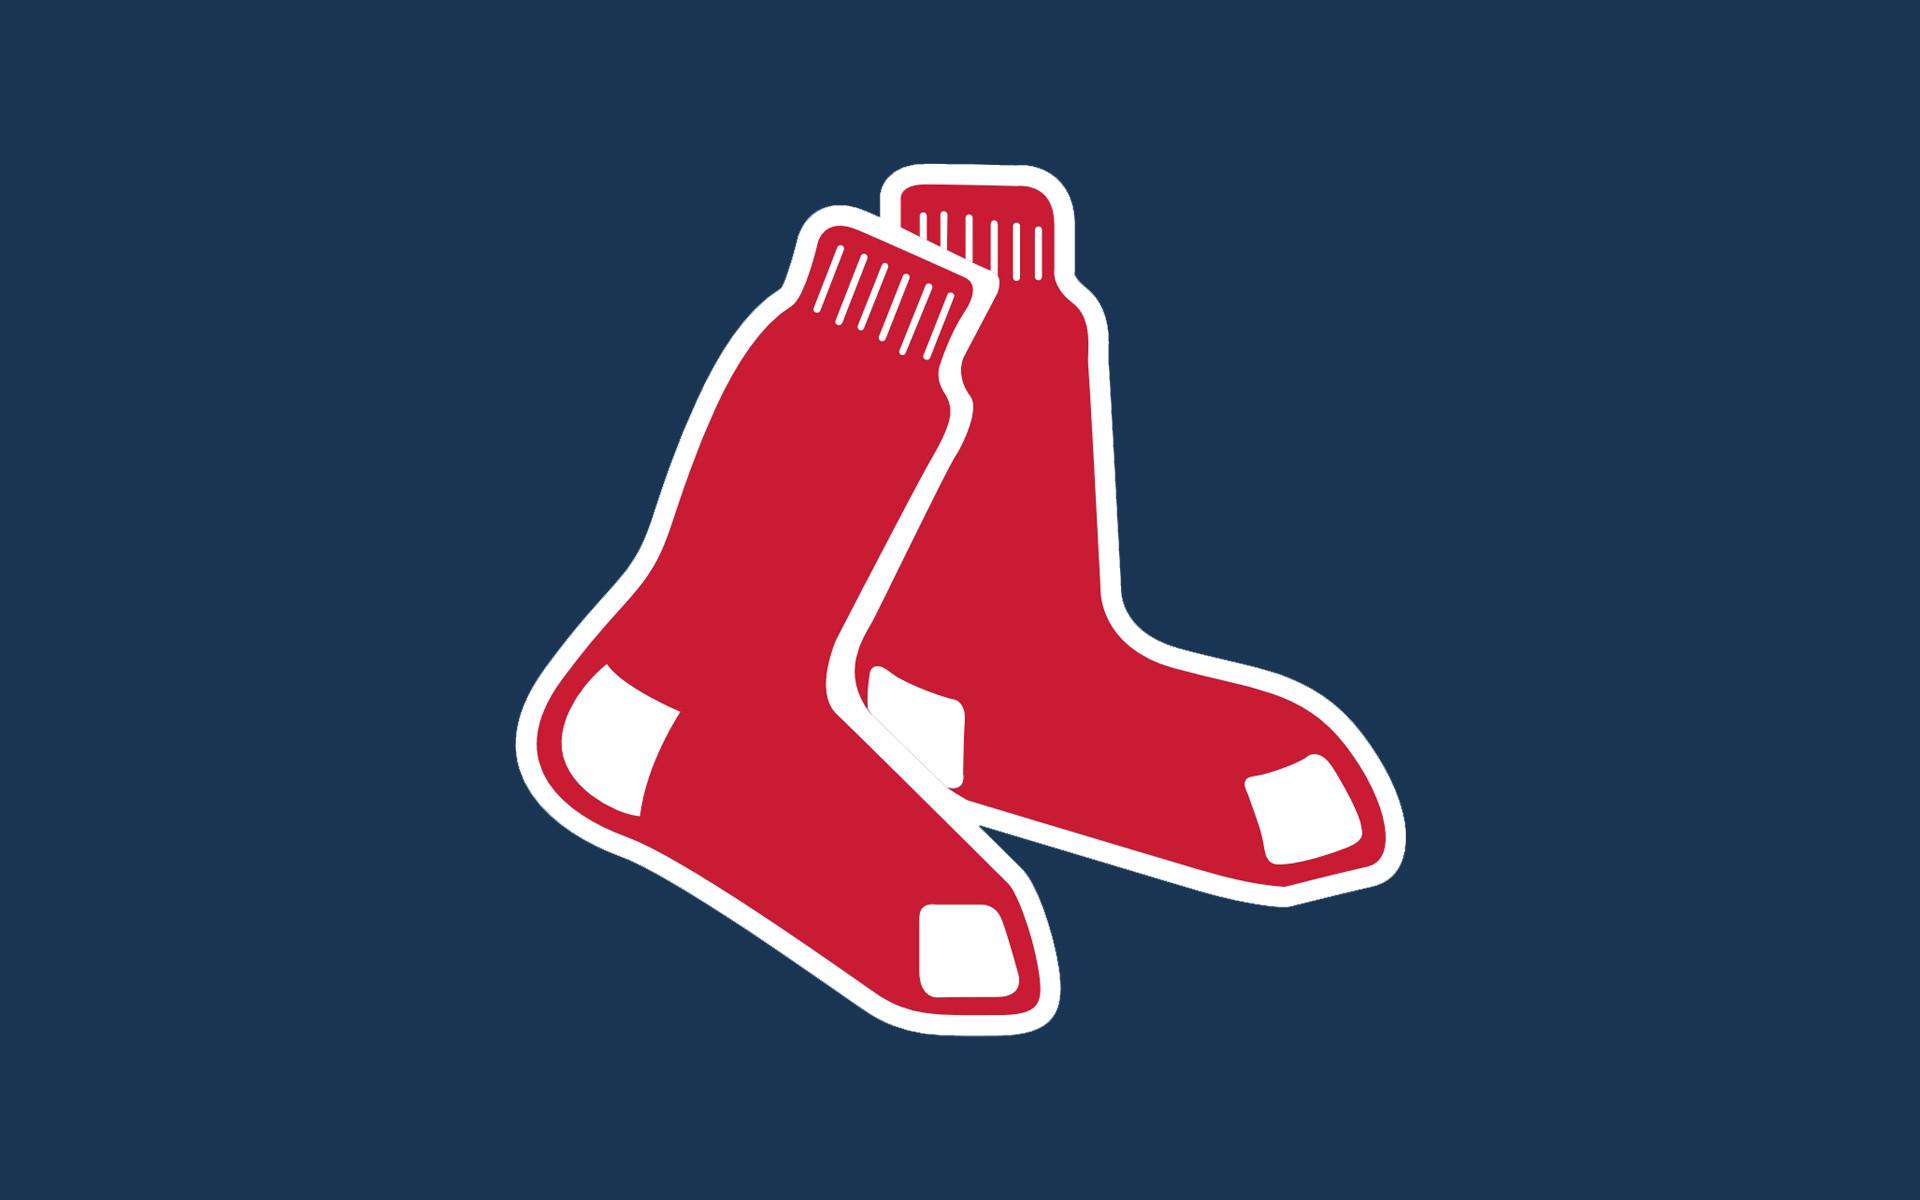 Red Sox Logo Wallpaper 1